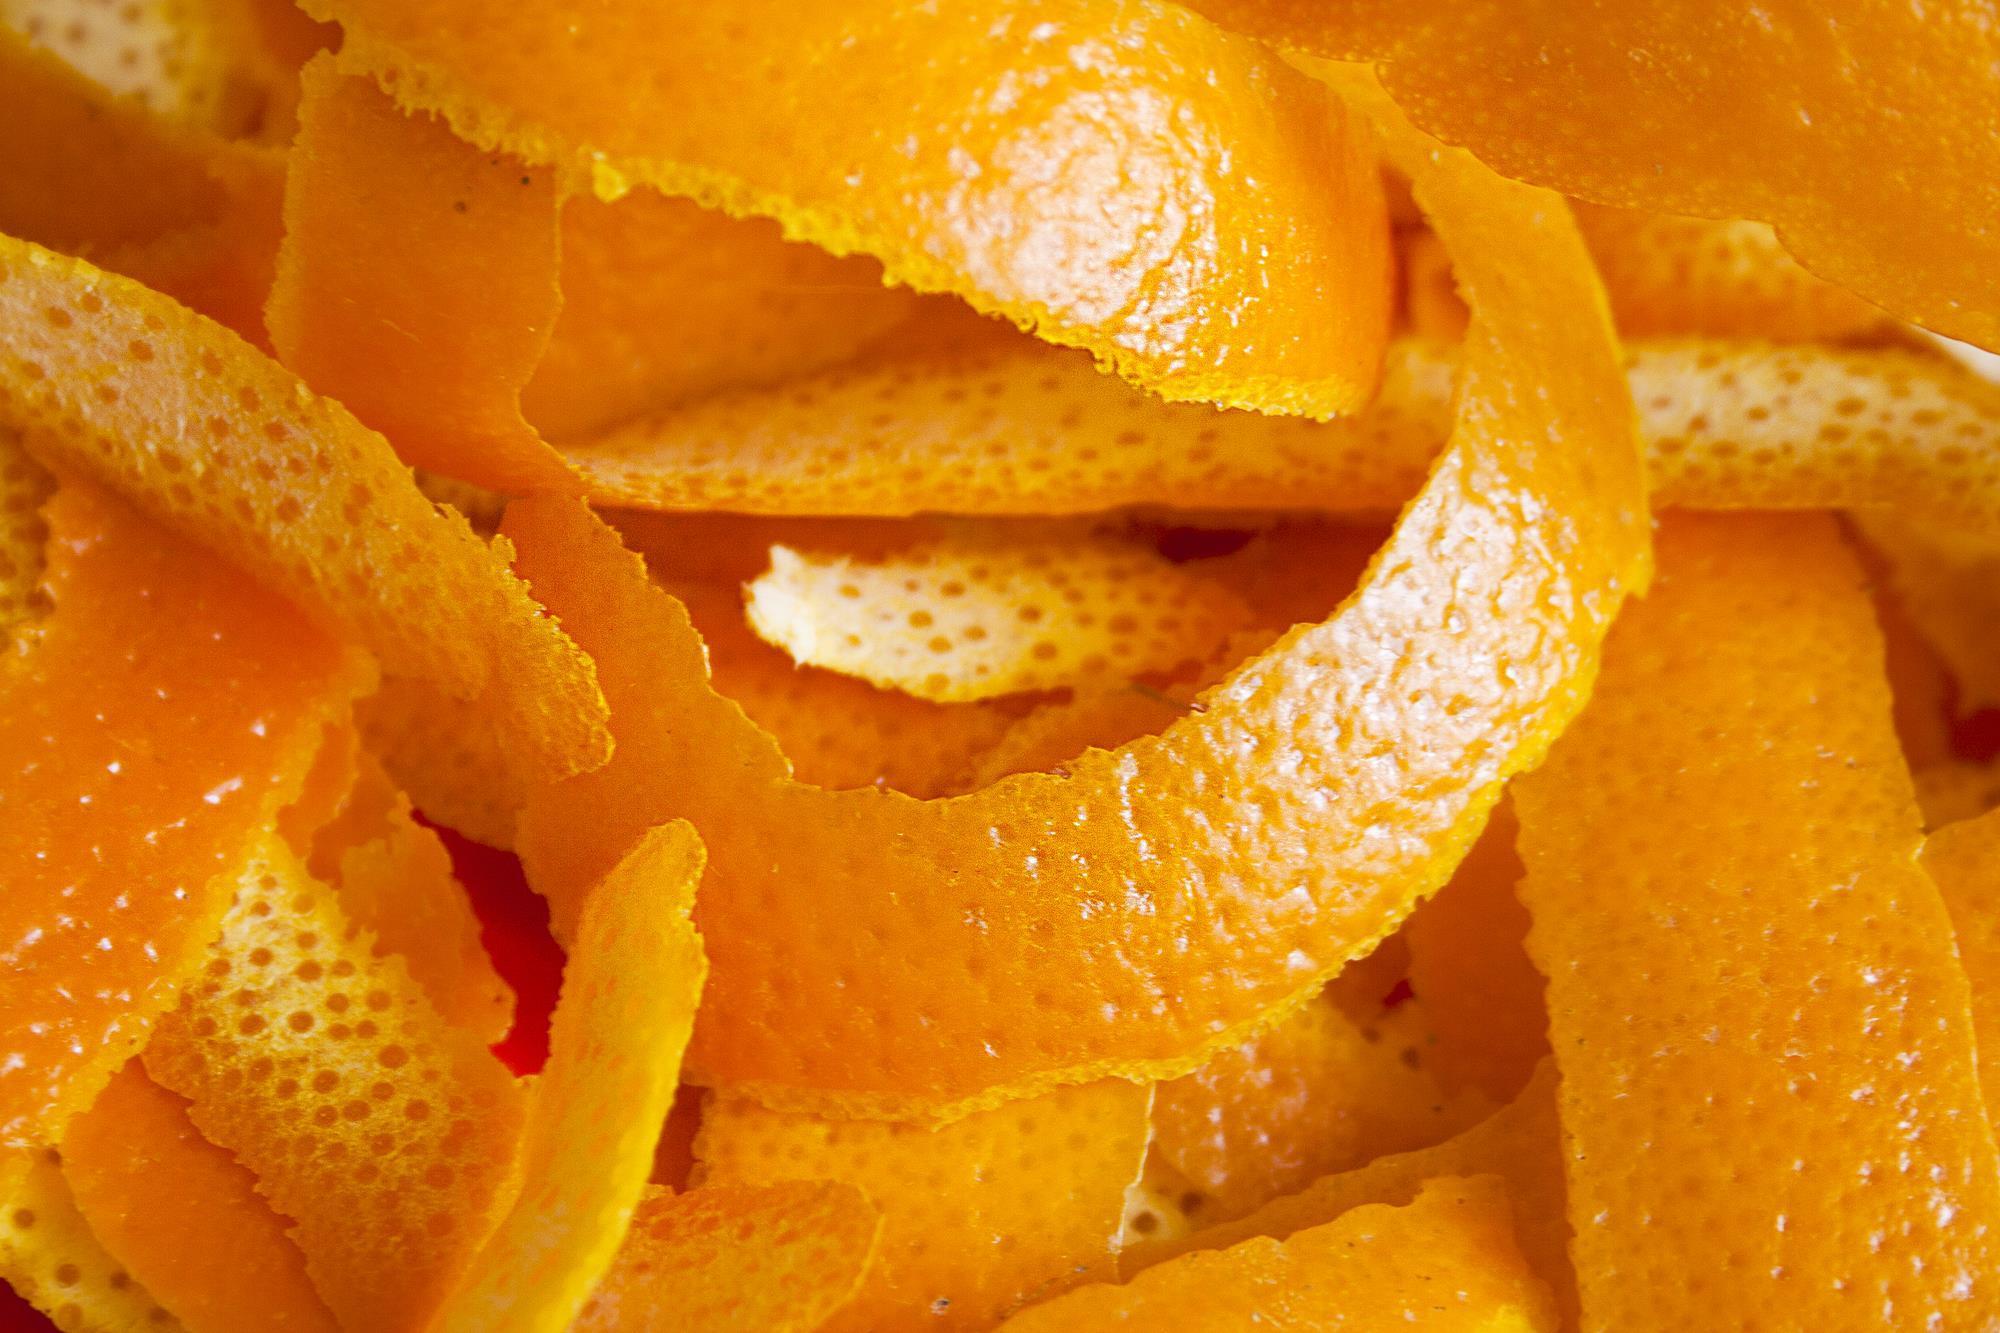 Twists of orange odorant reveal smell secrets